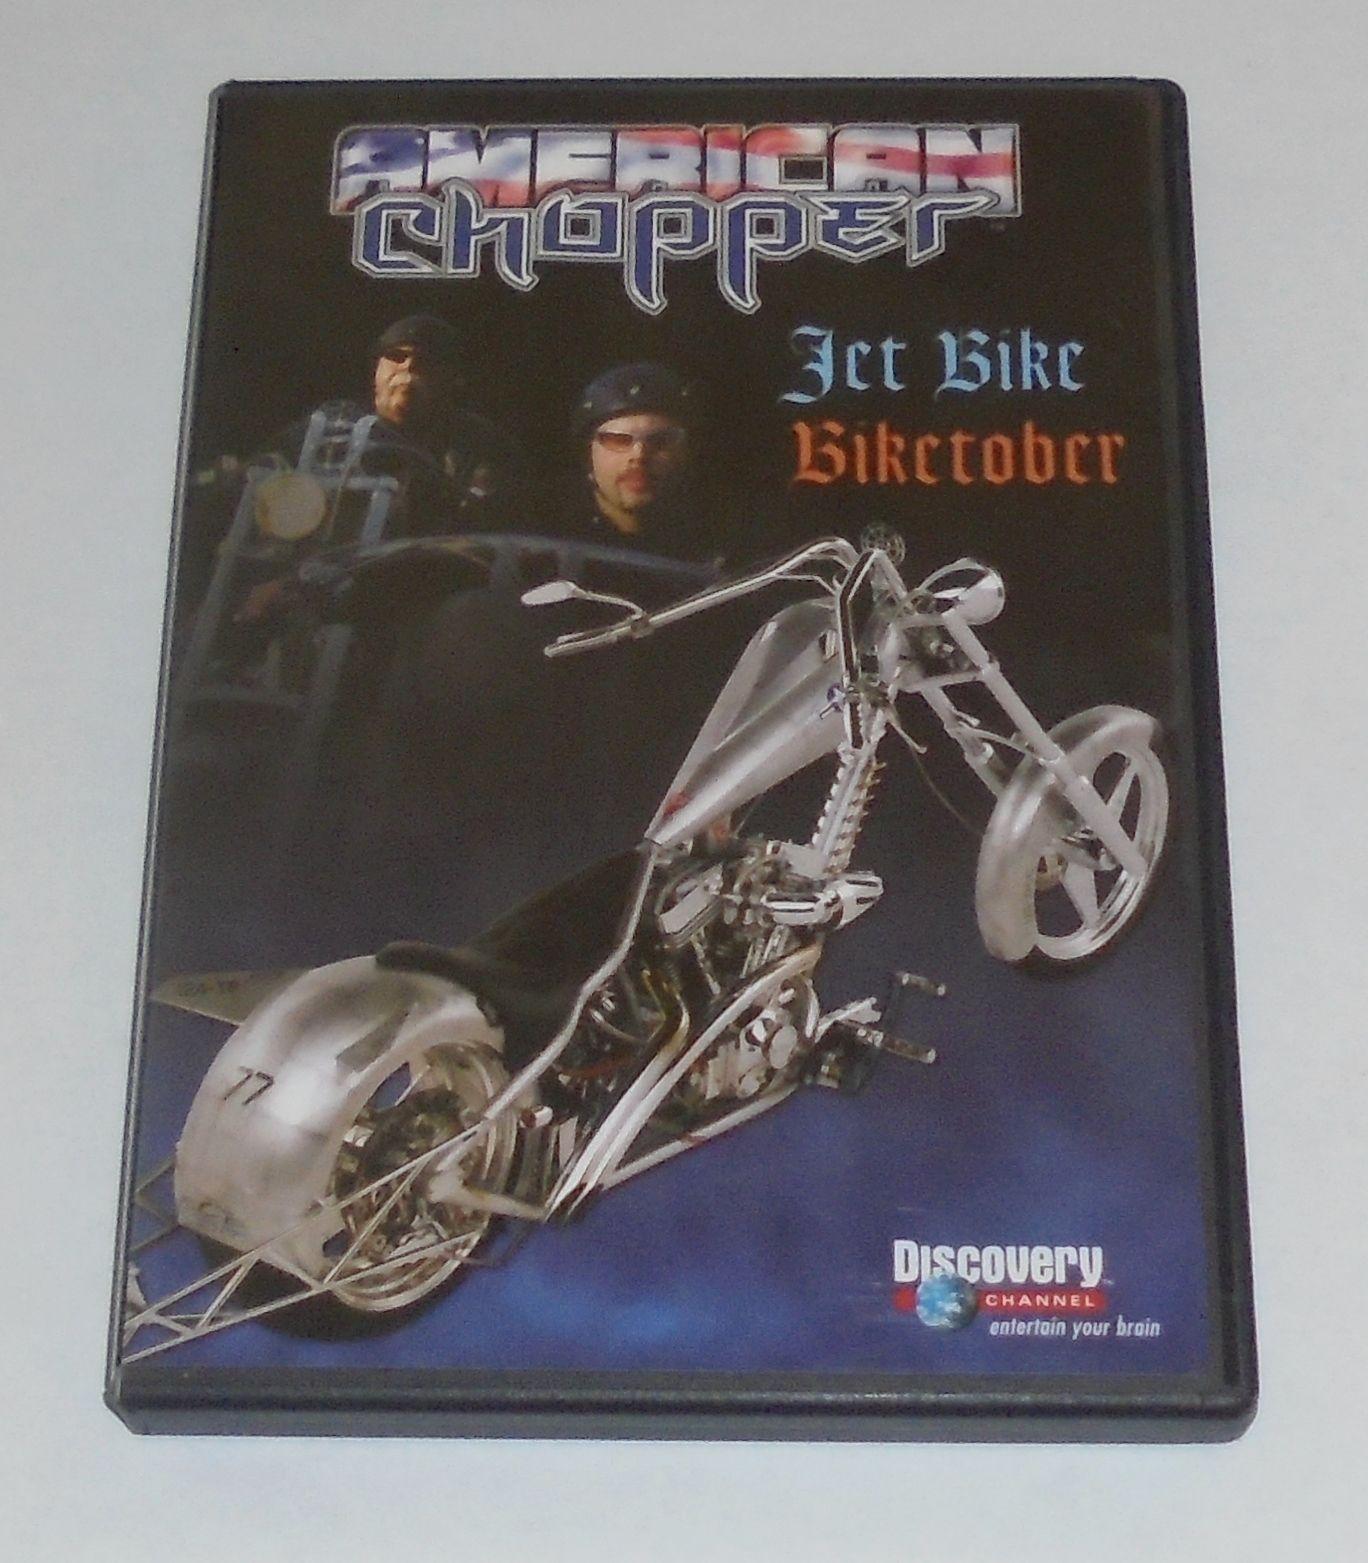 Discovery Channel American Chopper: Jet Bike & Biketober